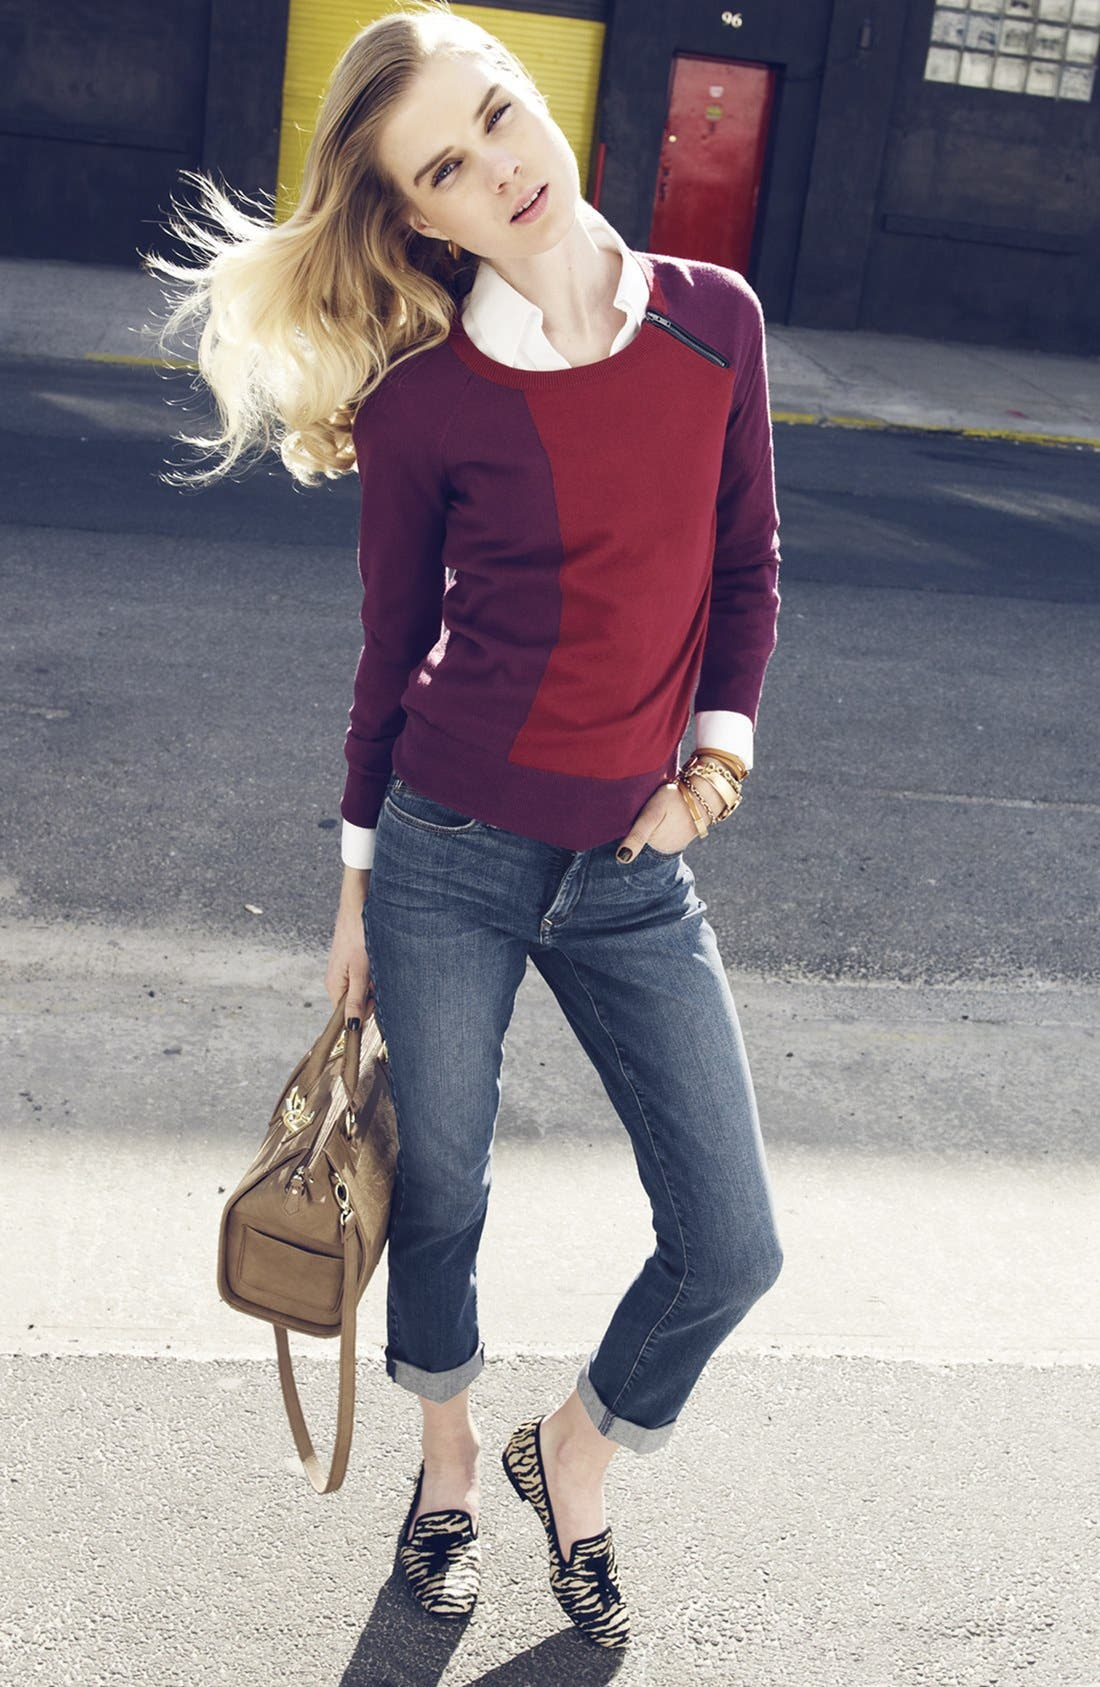 Alternate Image 1 Selected - Amber Sun Sweater, Foxcroft Shirt & NYDJ 'Leann' Skinny Boyfriend Jeans